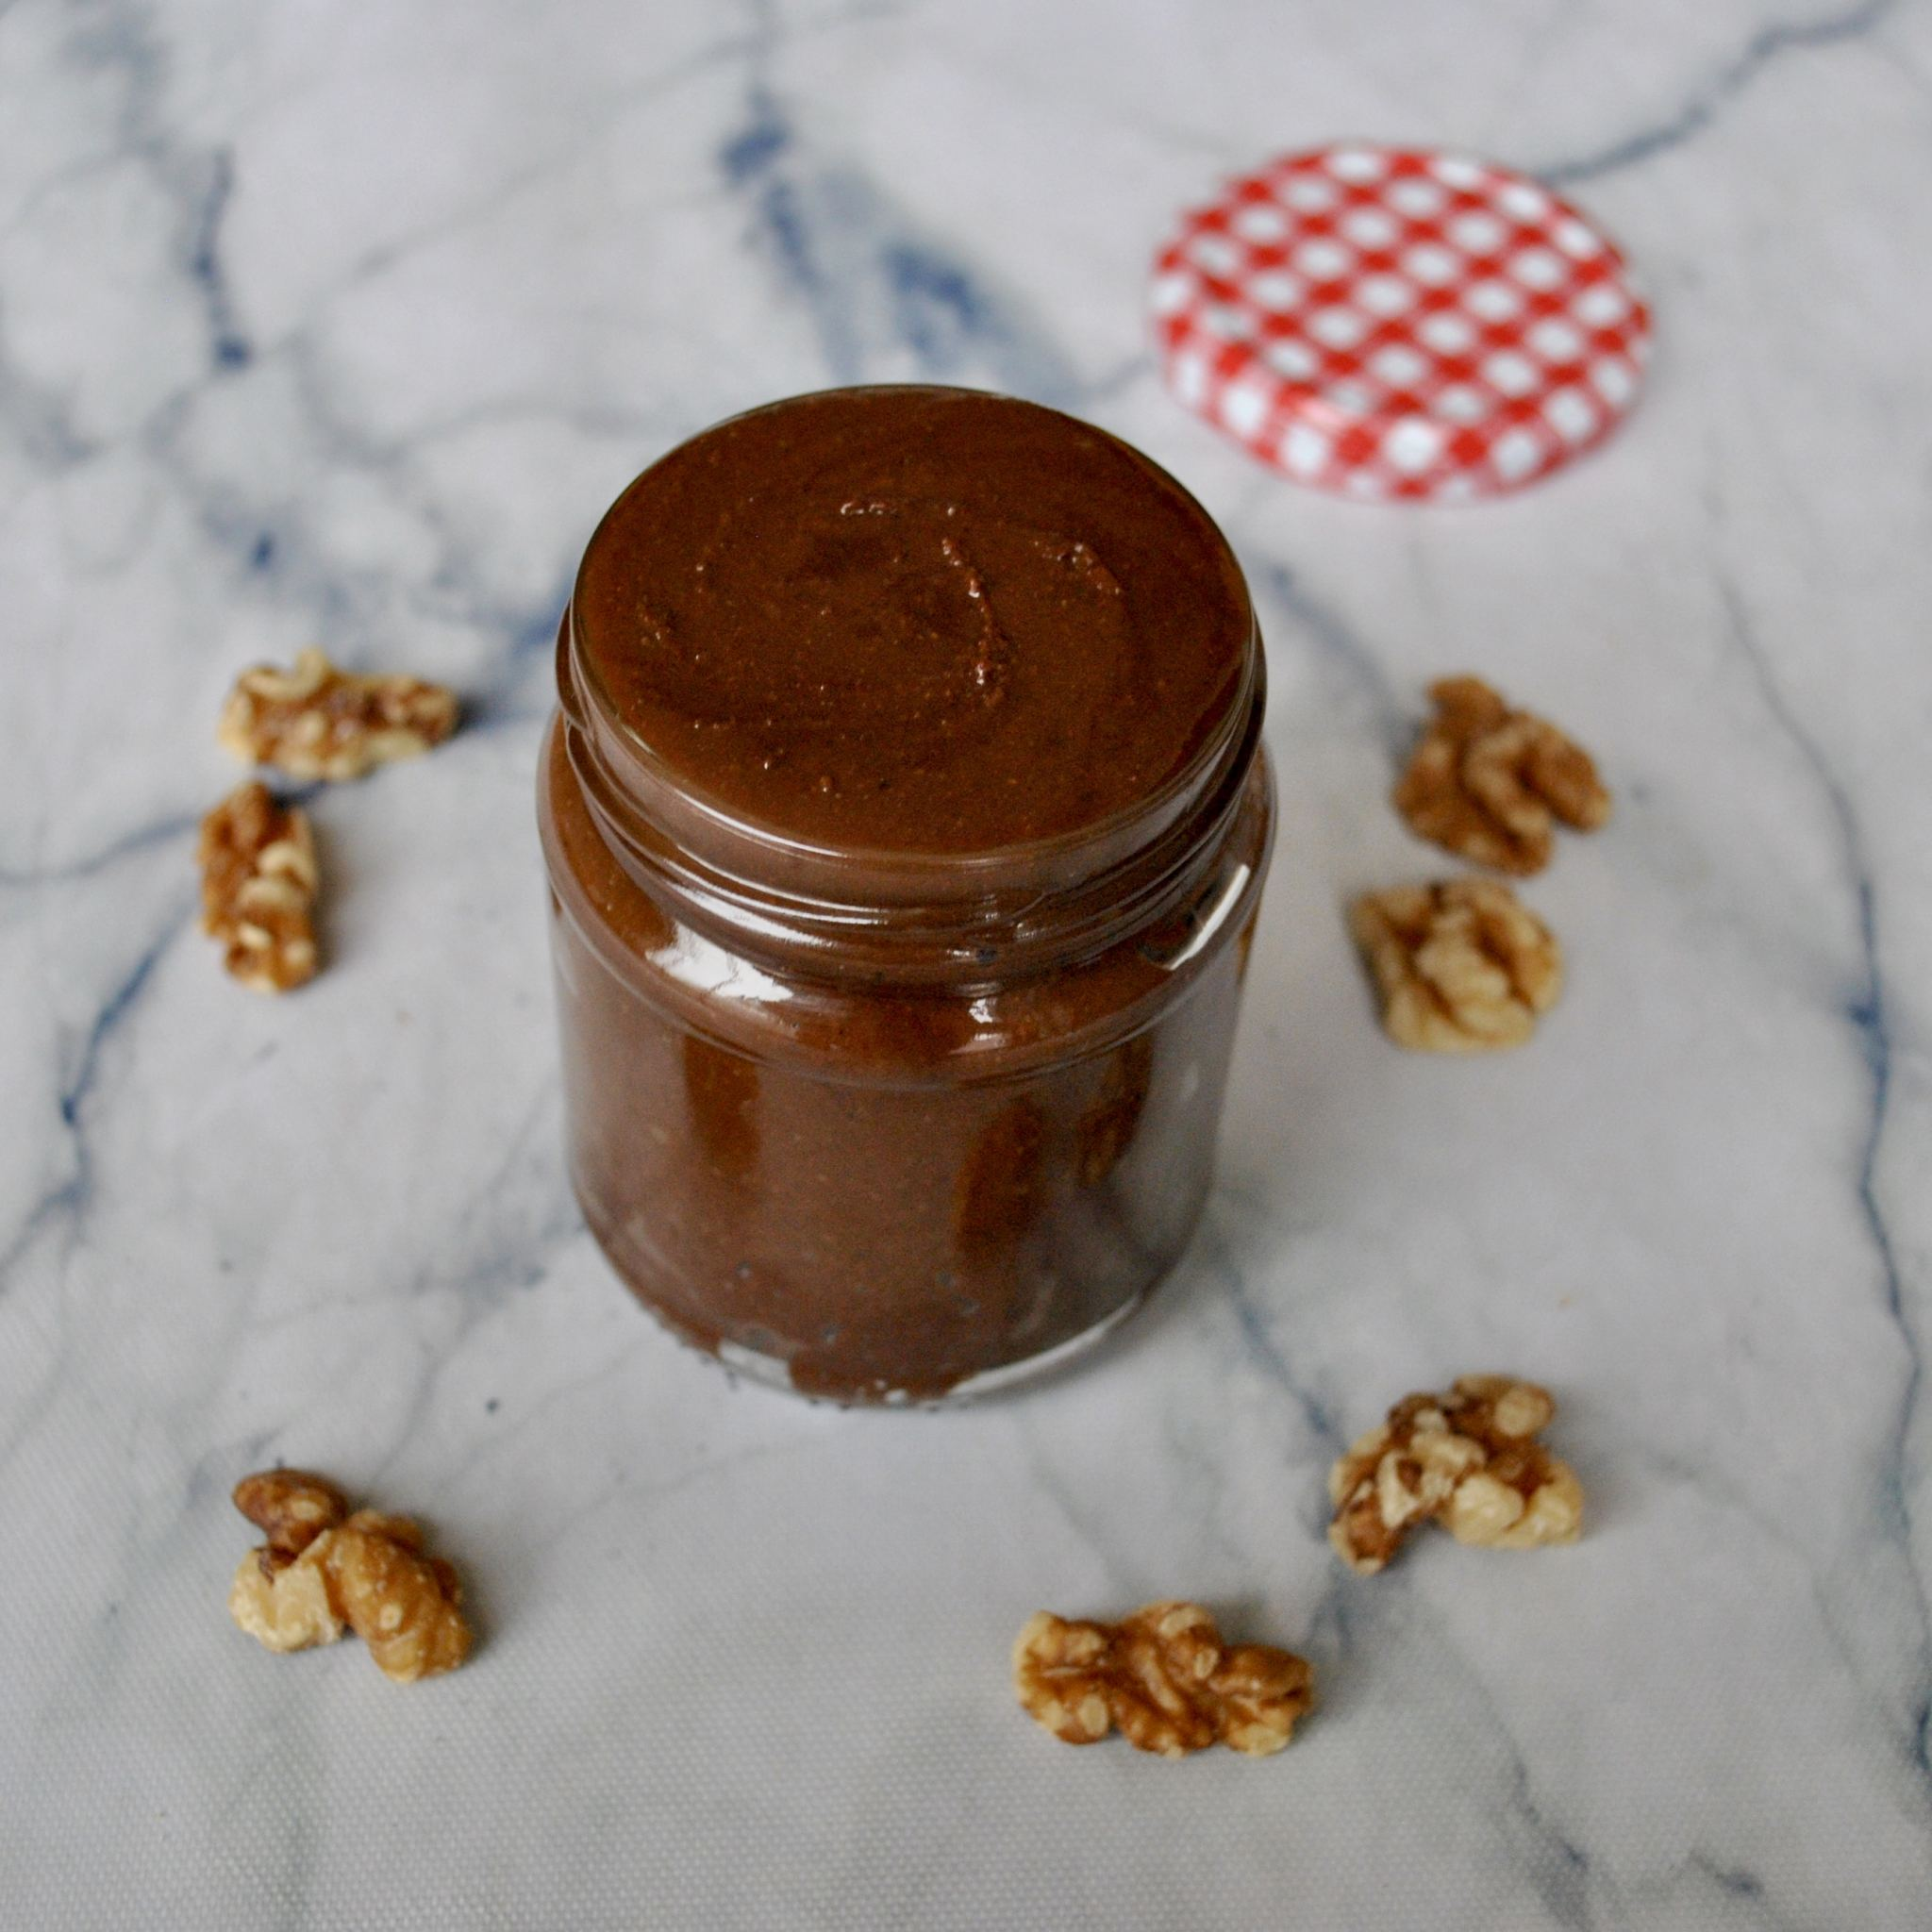 Walnutella - Chocolate Walnut Spread